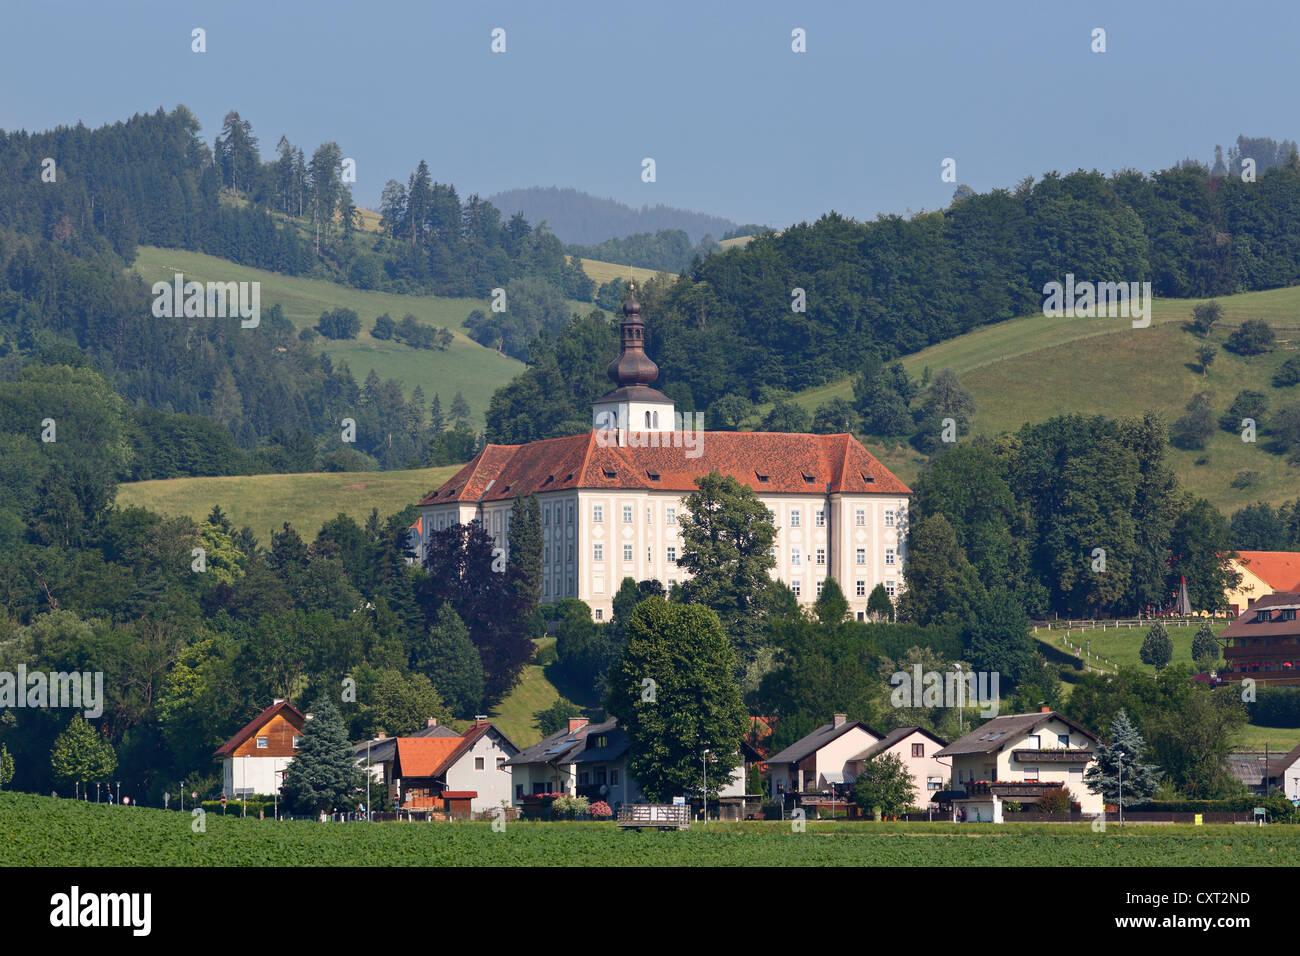 Schloss Piber Castle, municipality of Koeflach, Styria, Austria, Europe, PublicGround - Stock Image